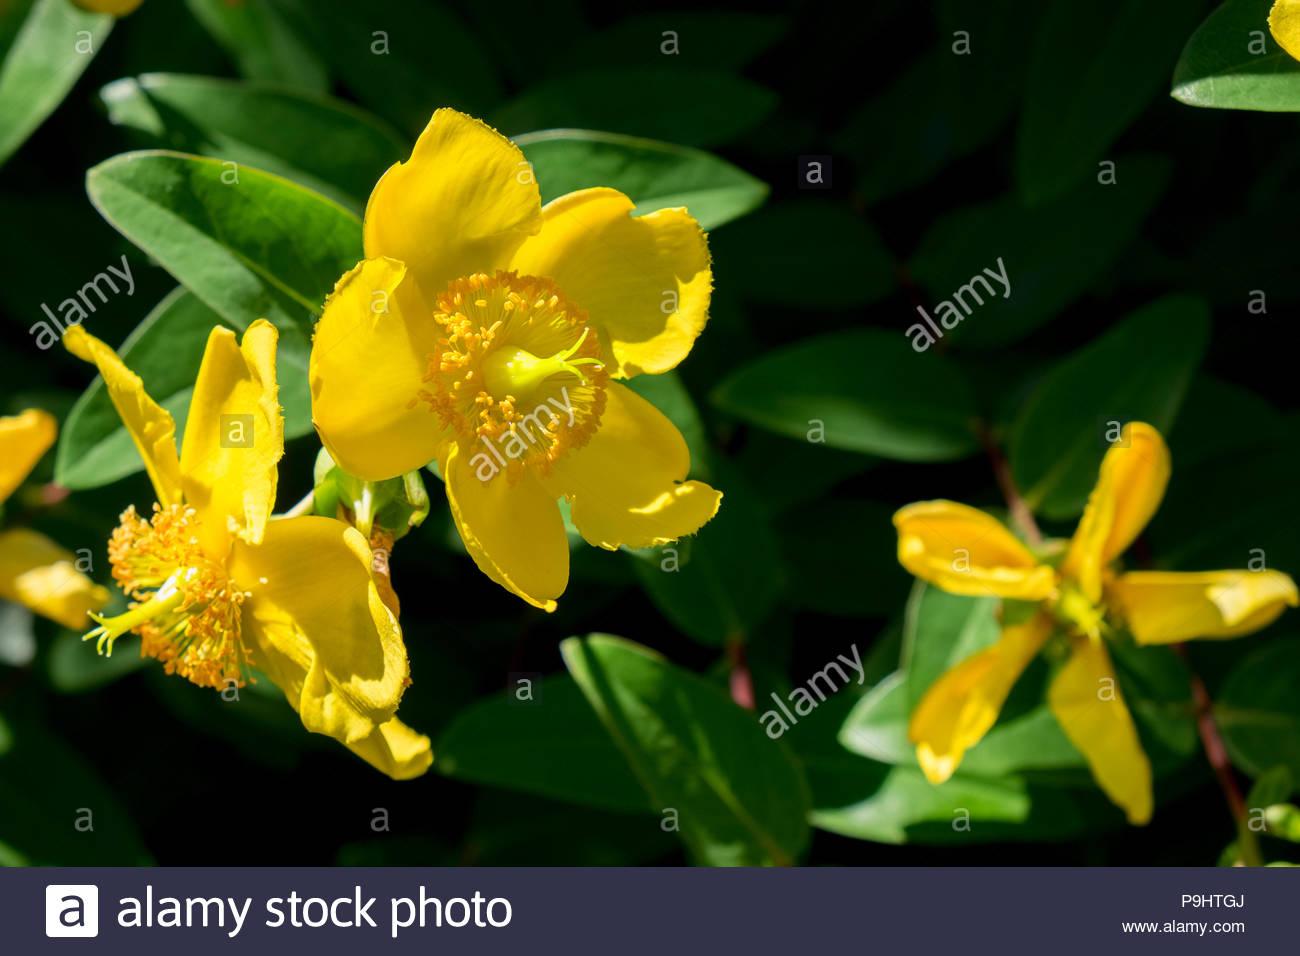 Johanniskraut, or St. John's Wort, an herbal alternative anti-depressant. Stock Photo